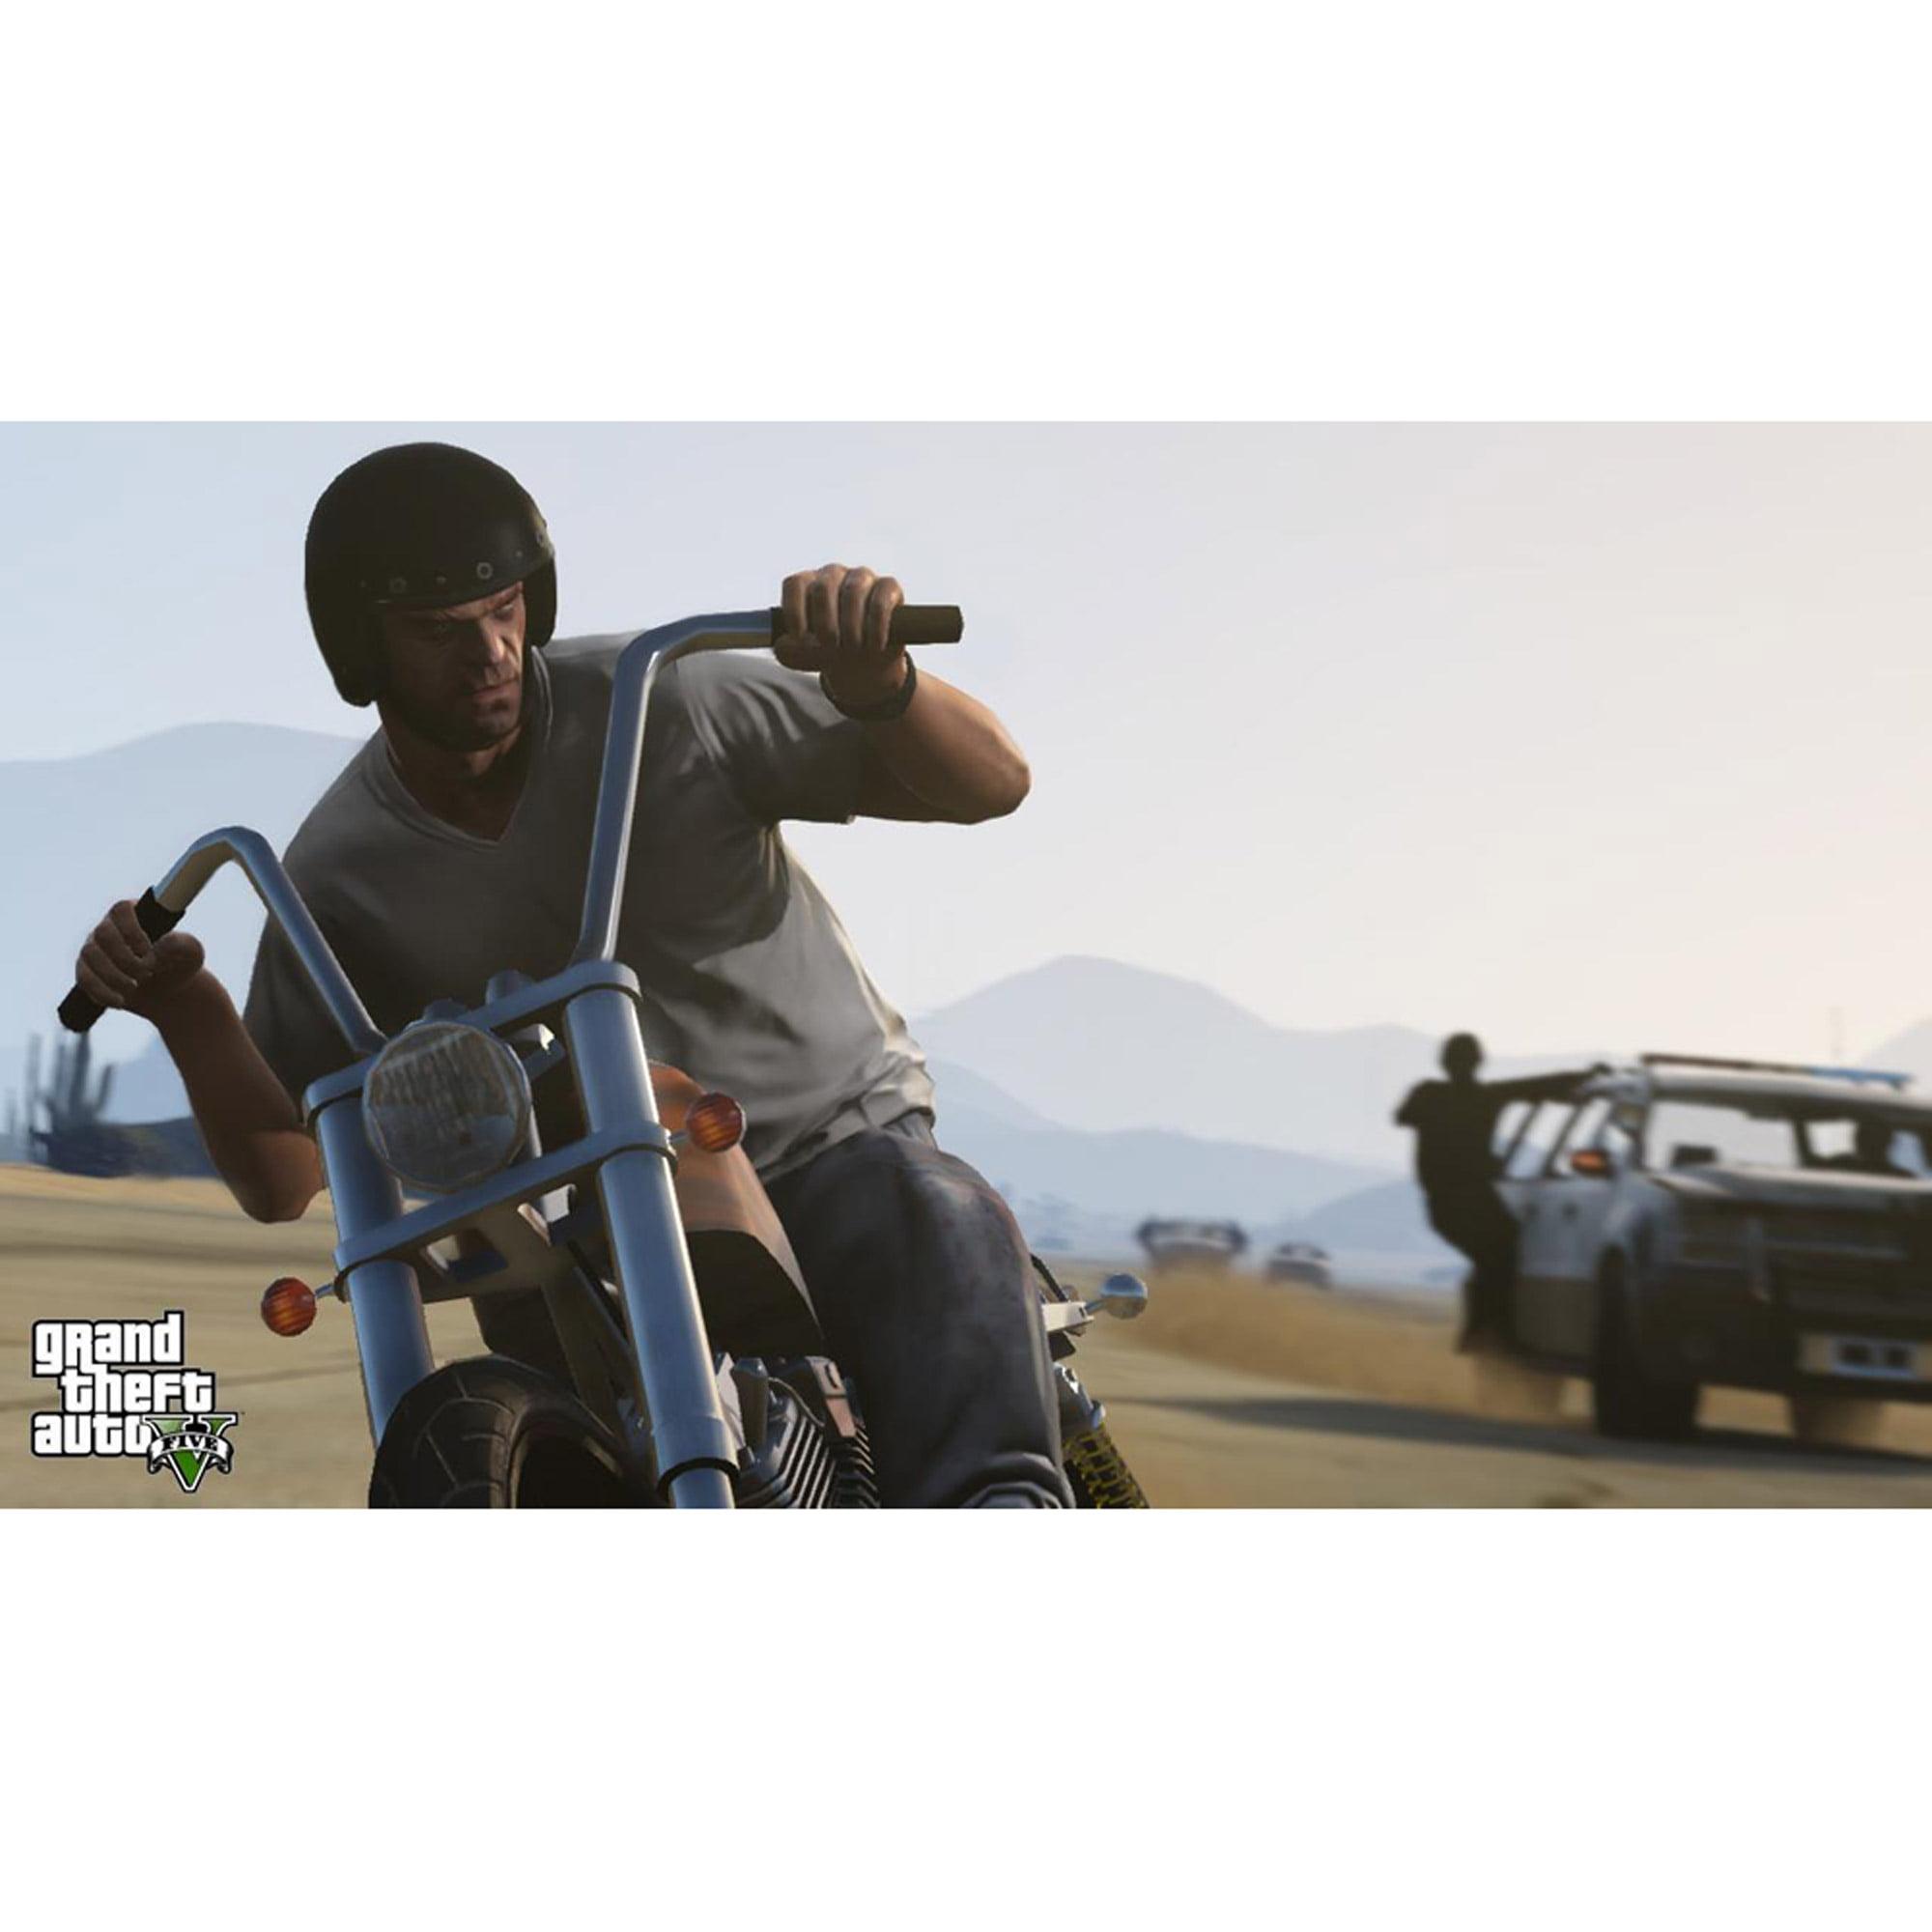 Grand Theft Auto V Xbox  Rockstar Games - Minecraft xbox 360 los angeles map download